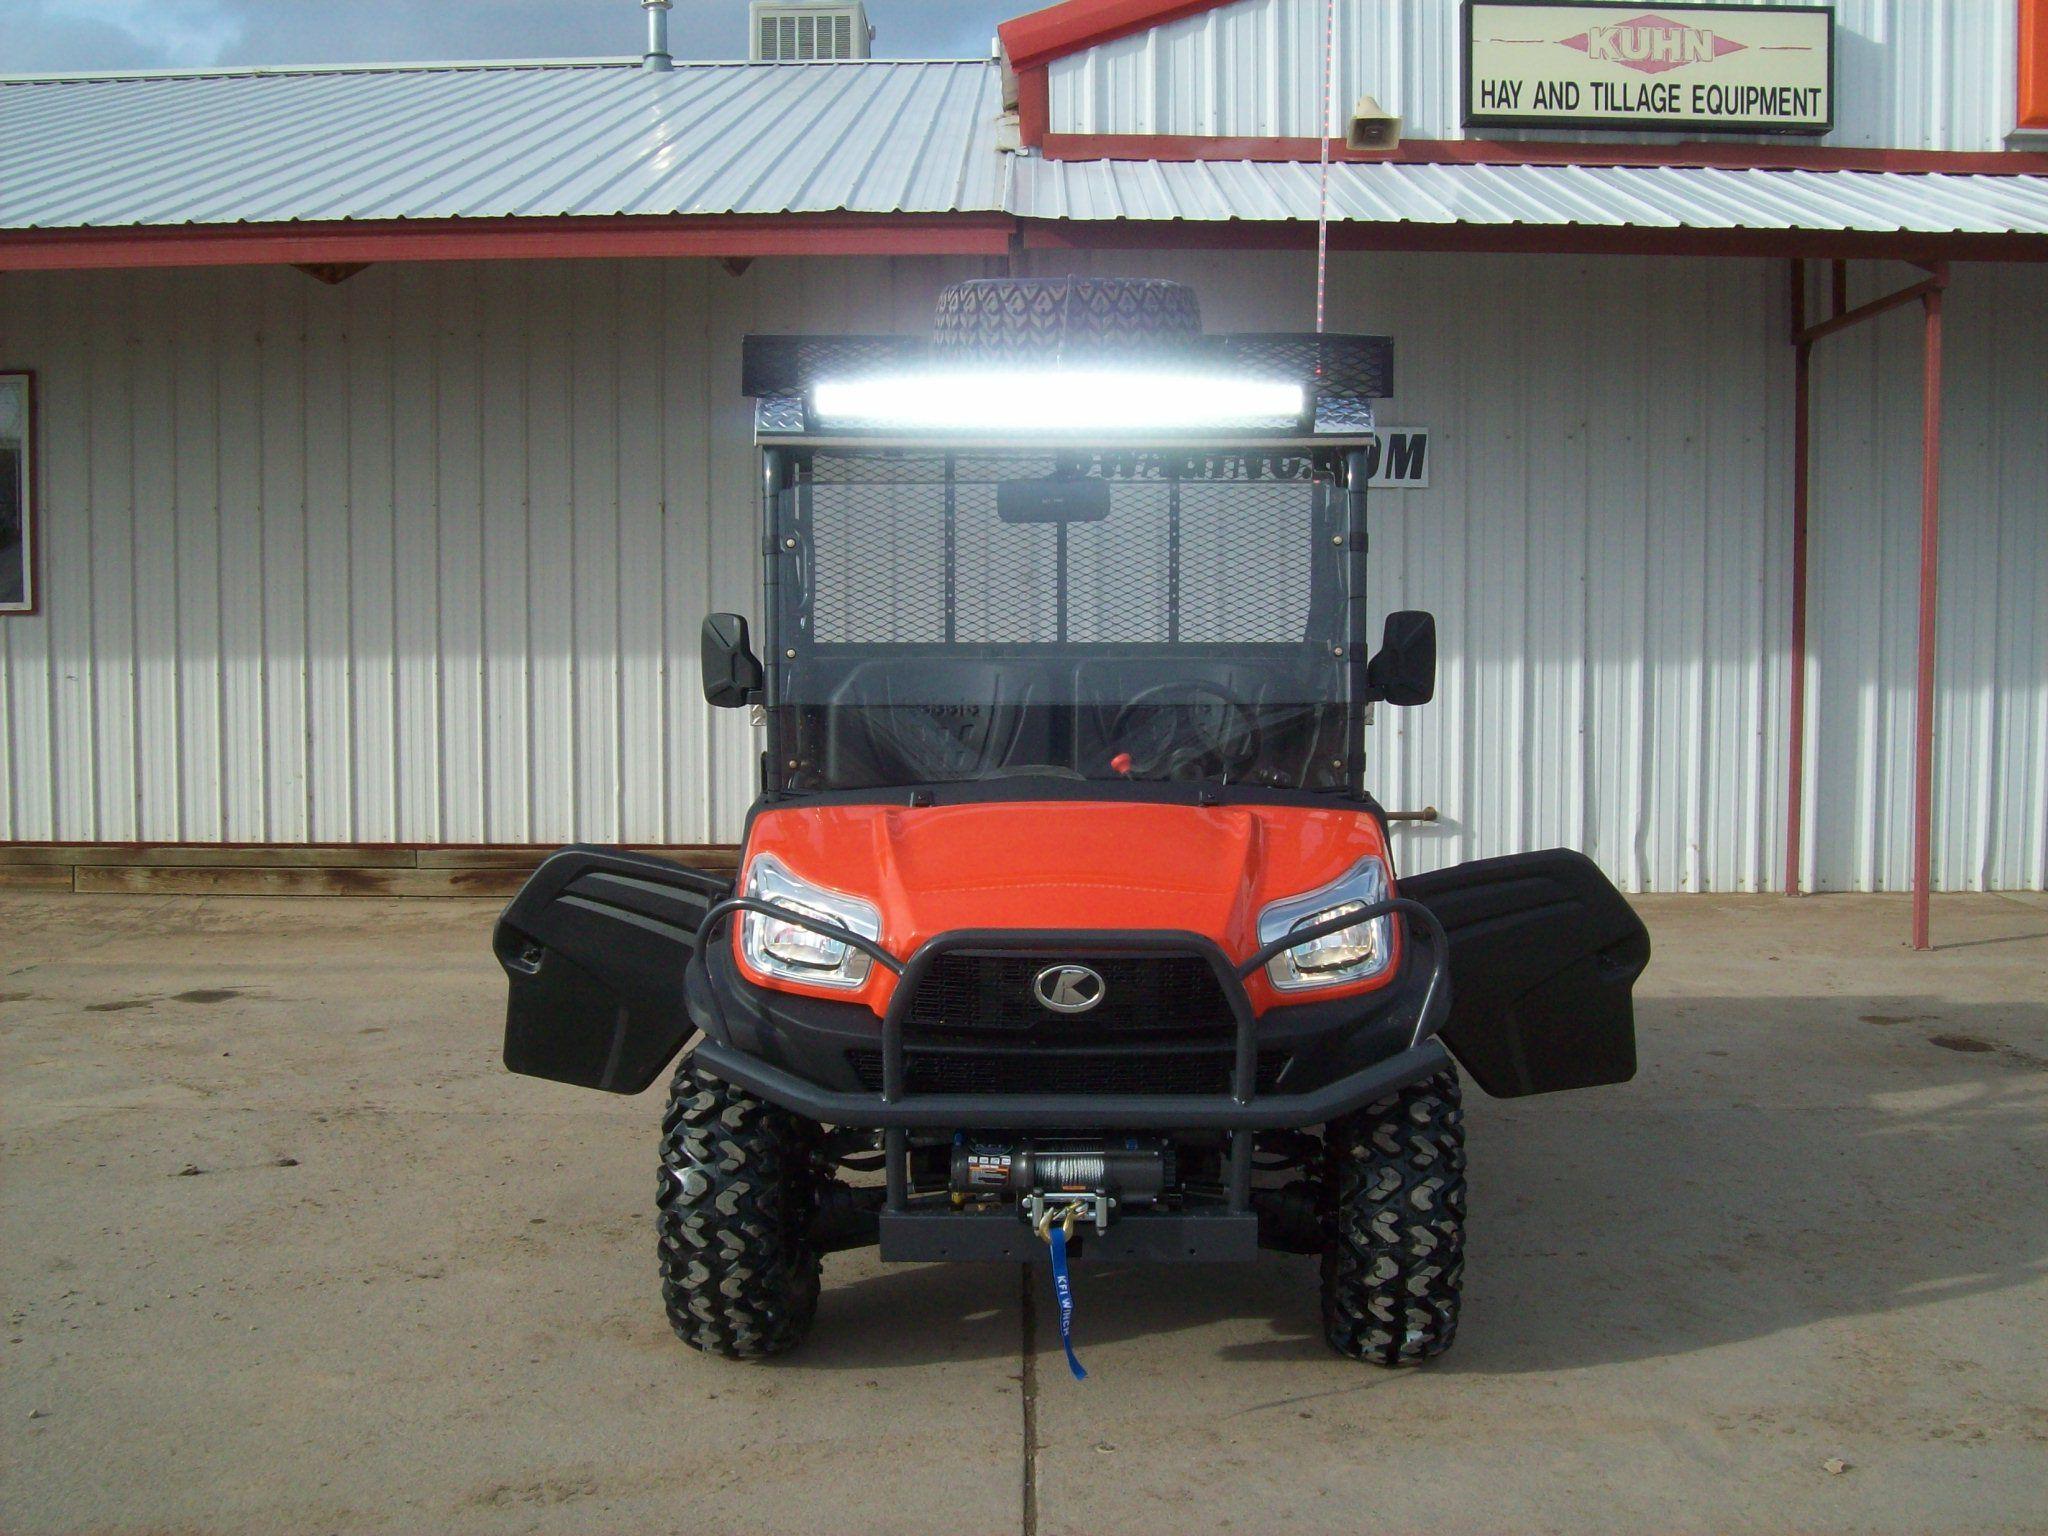 Kubota RTV X1120D with LED light bar.